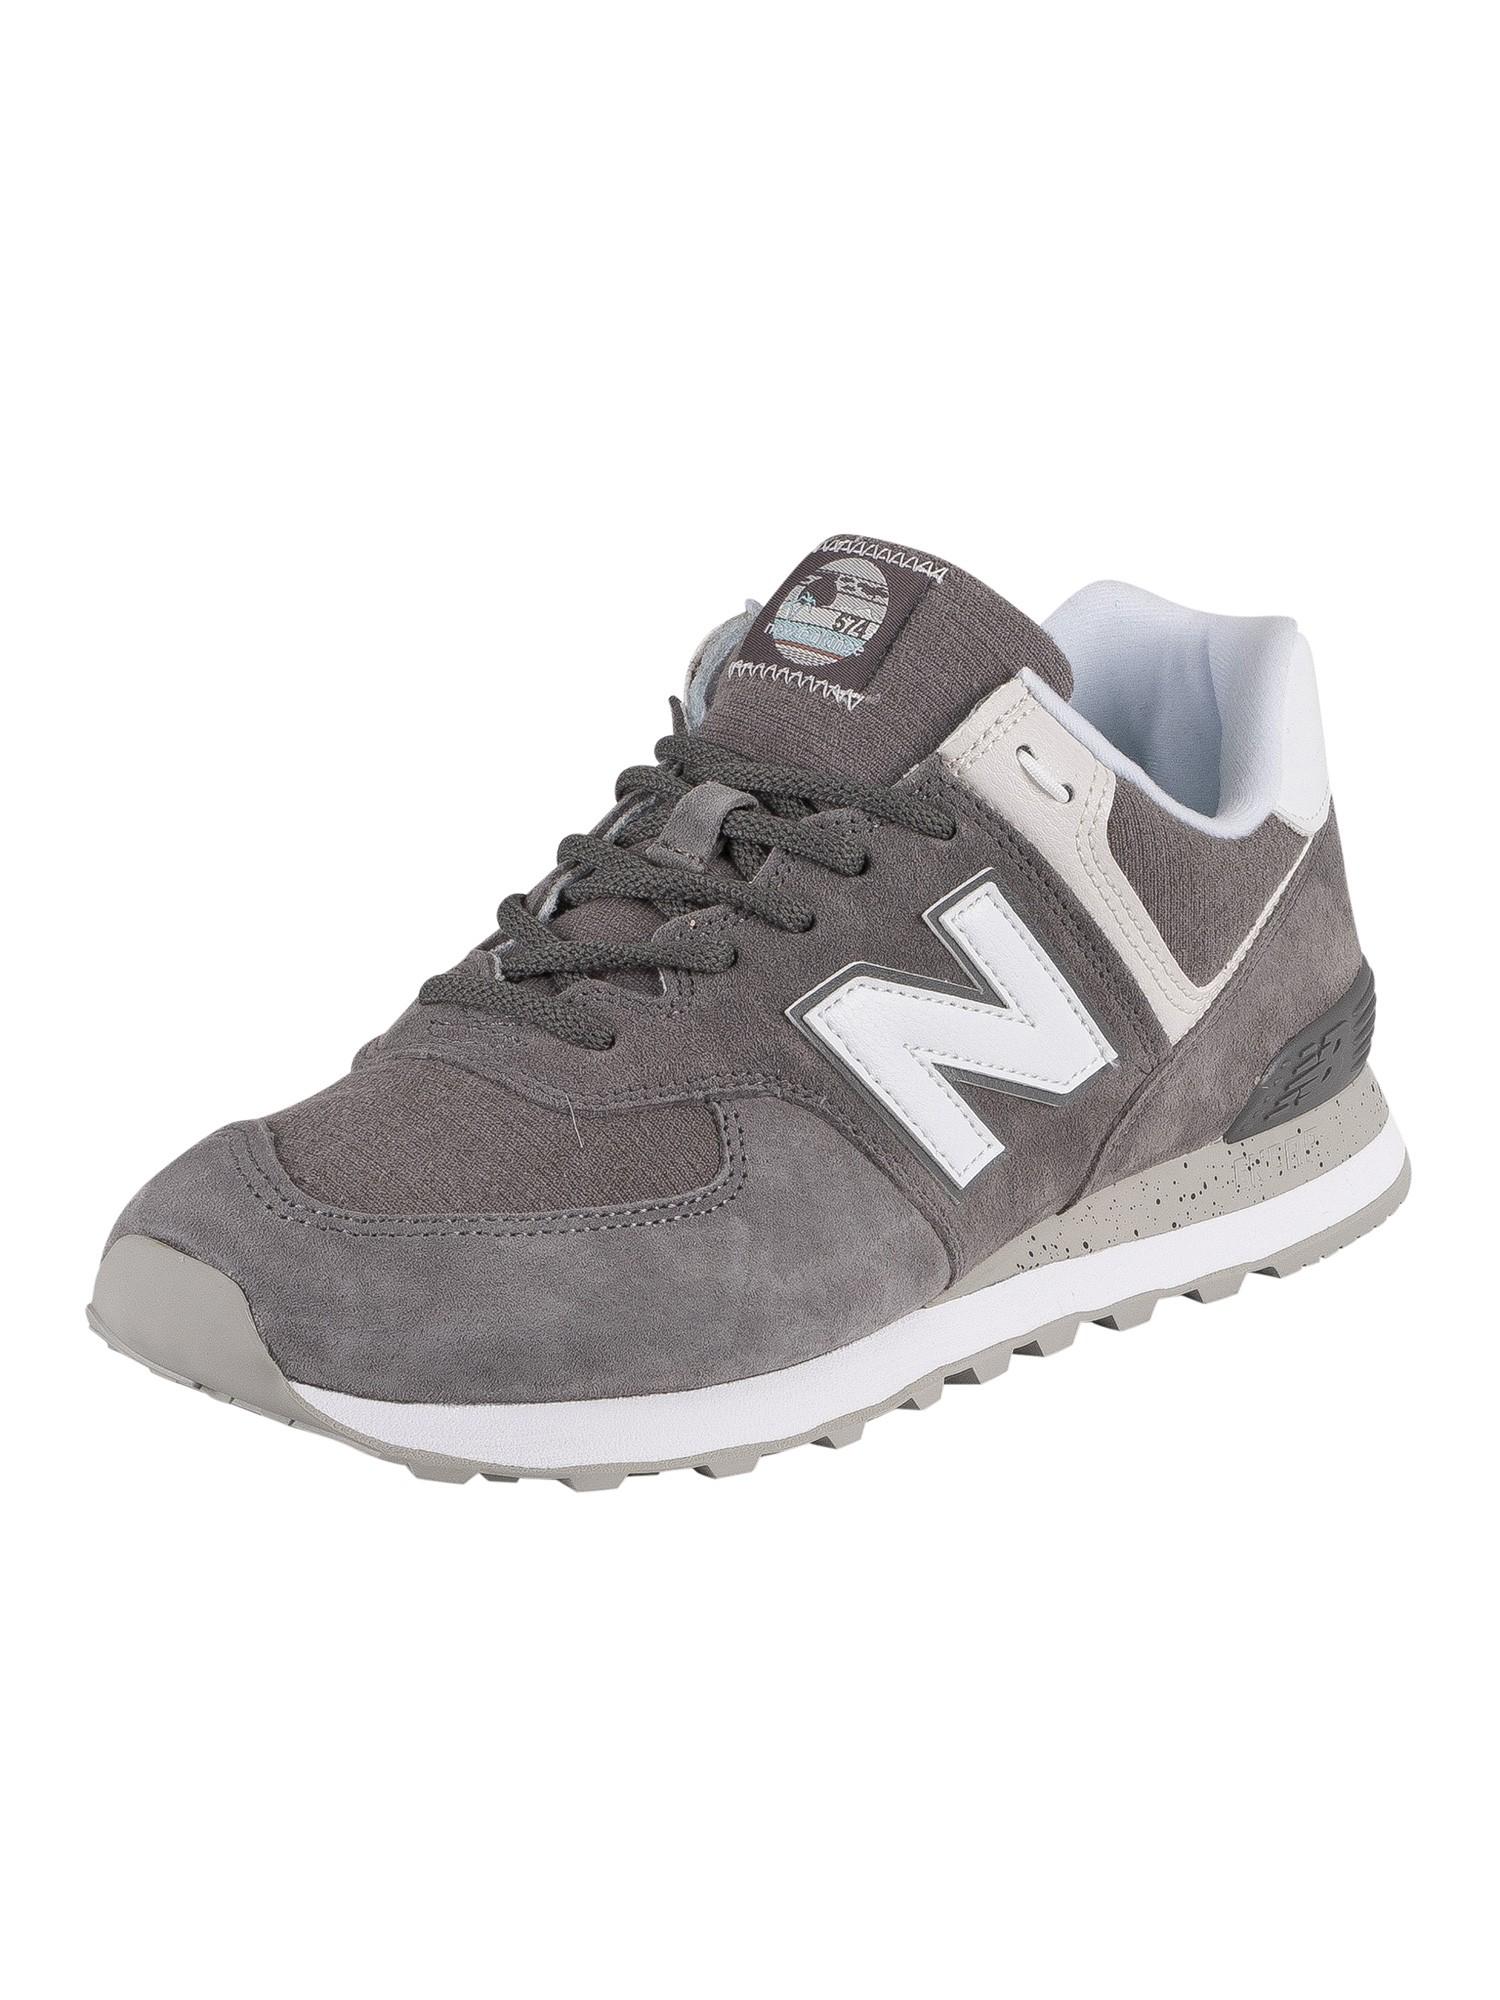 new balance 574 suede grey